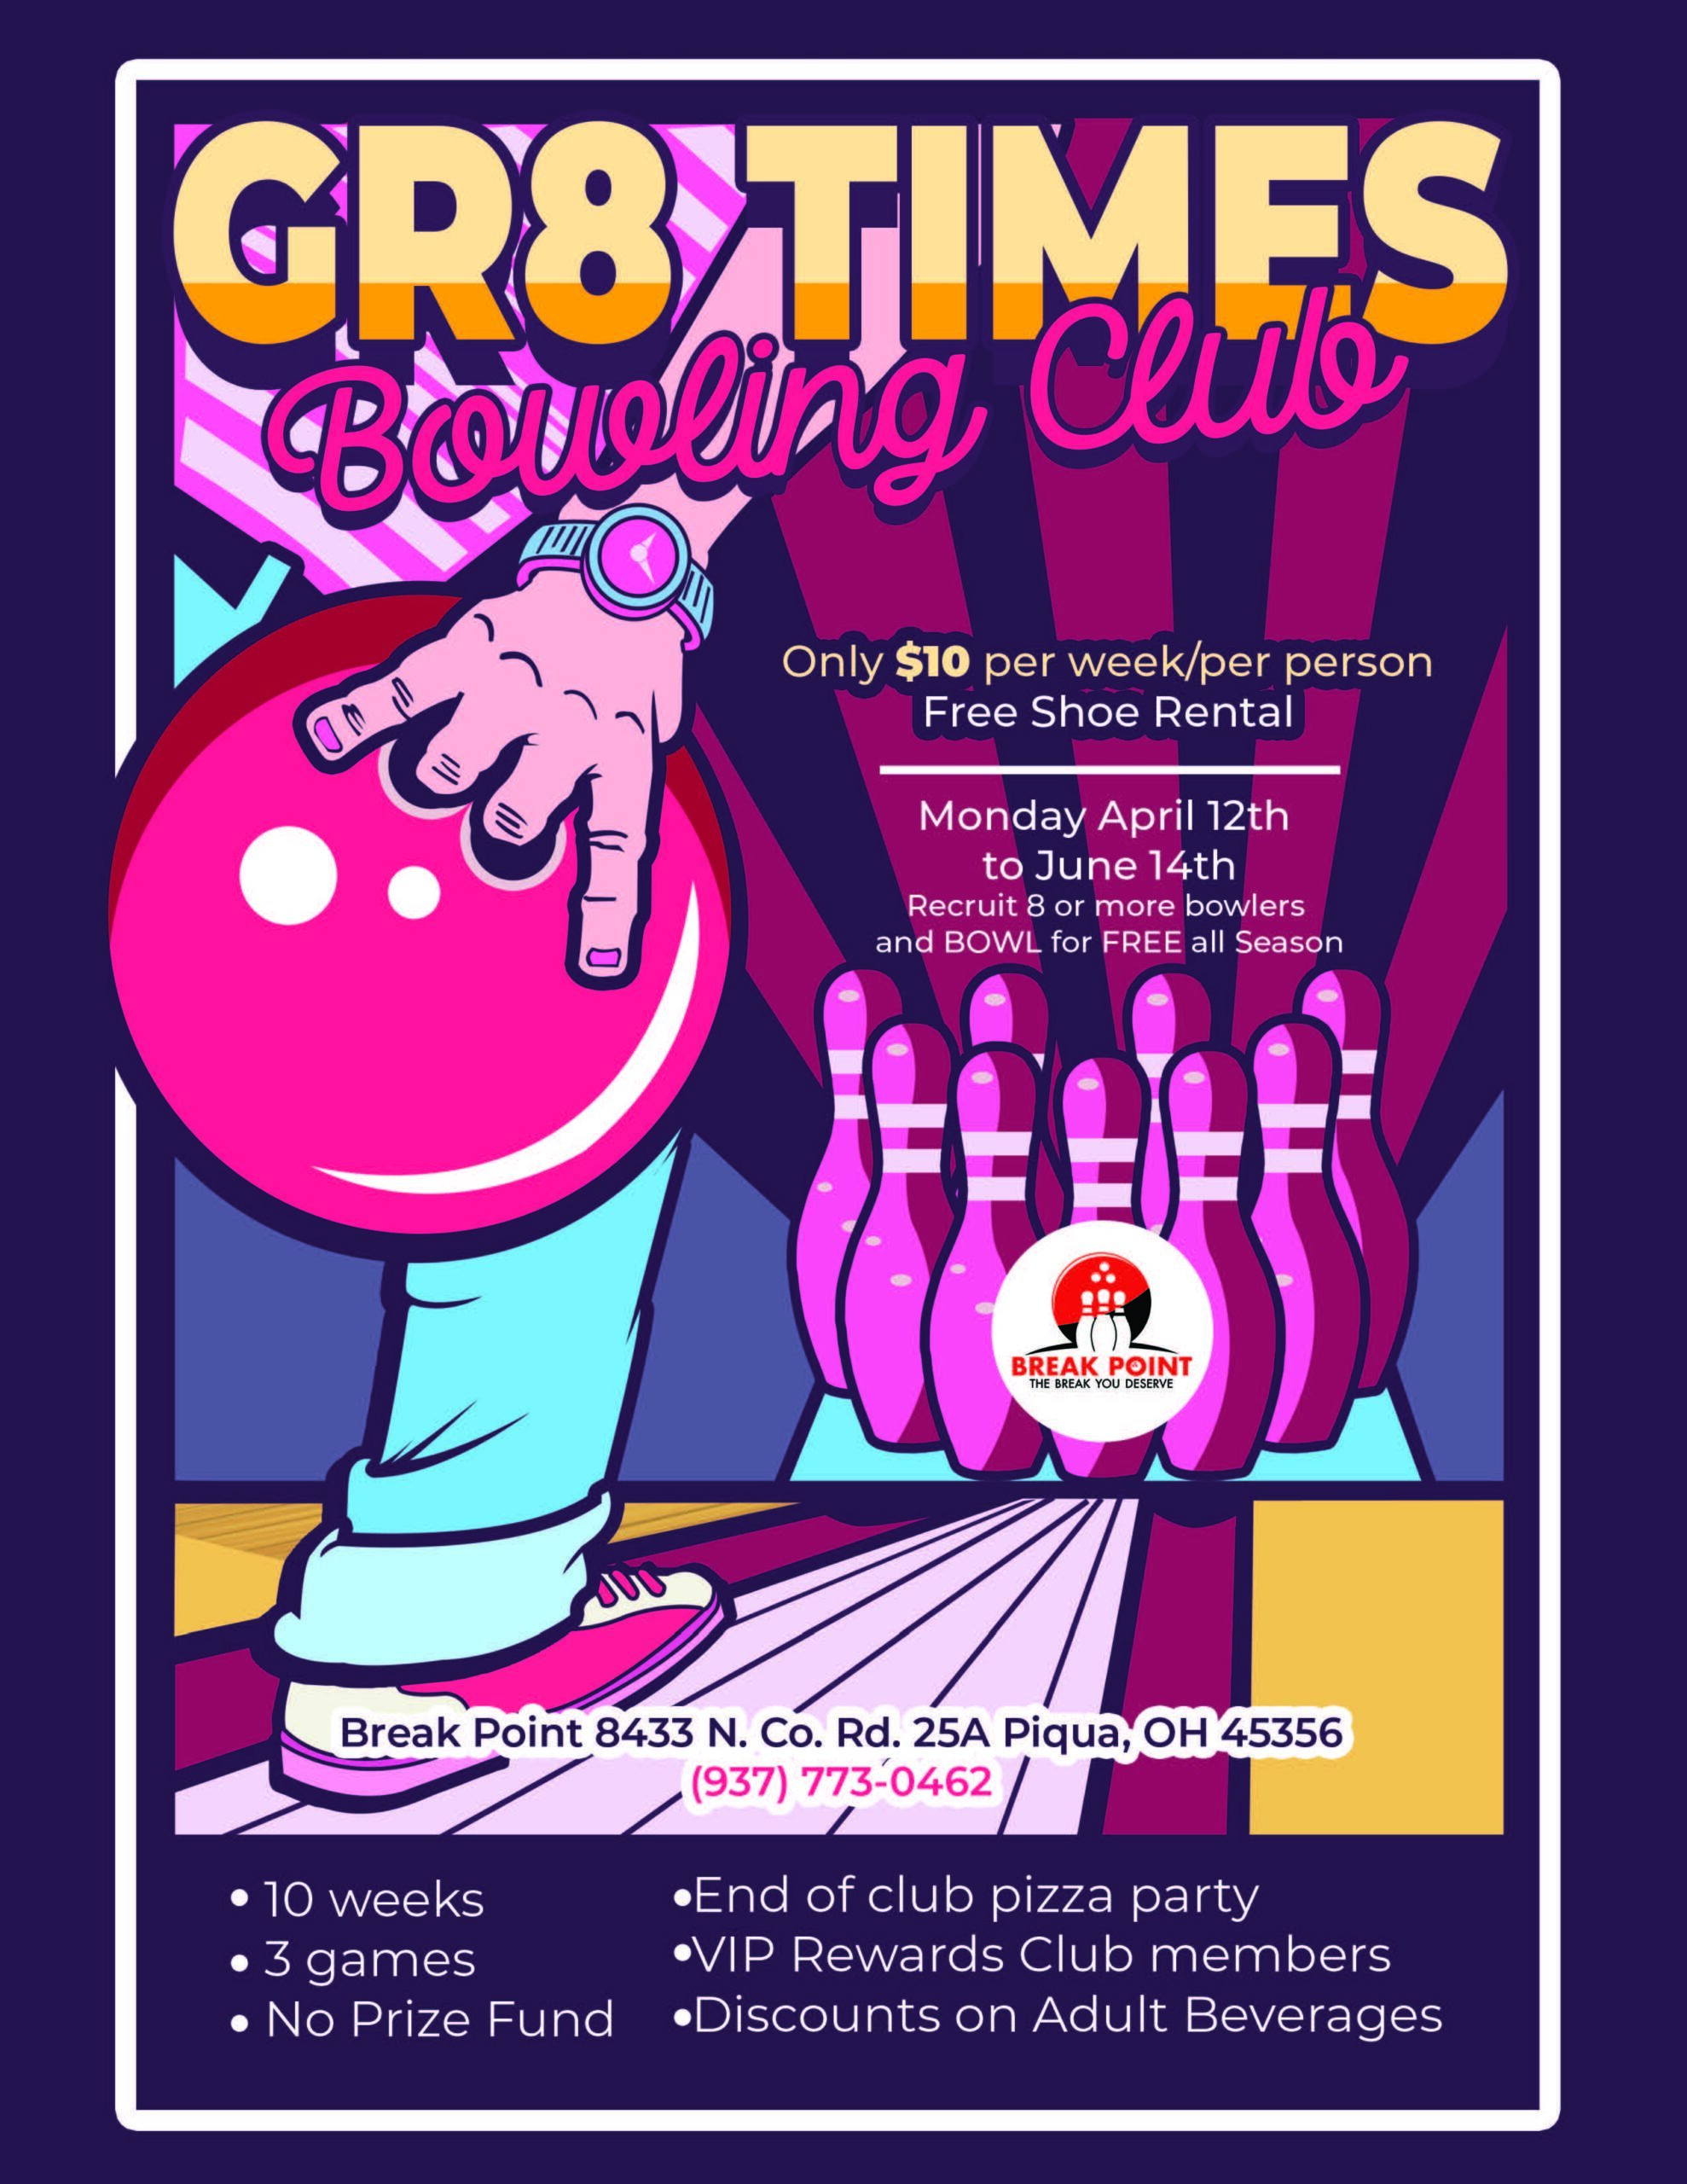 GR8 Times Bowling Club